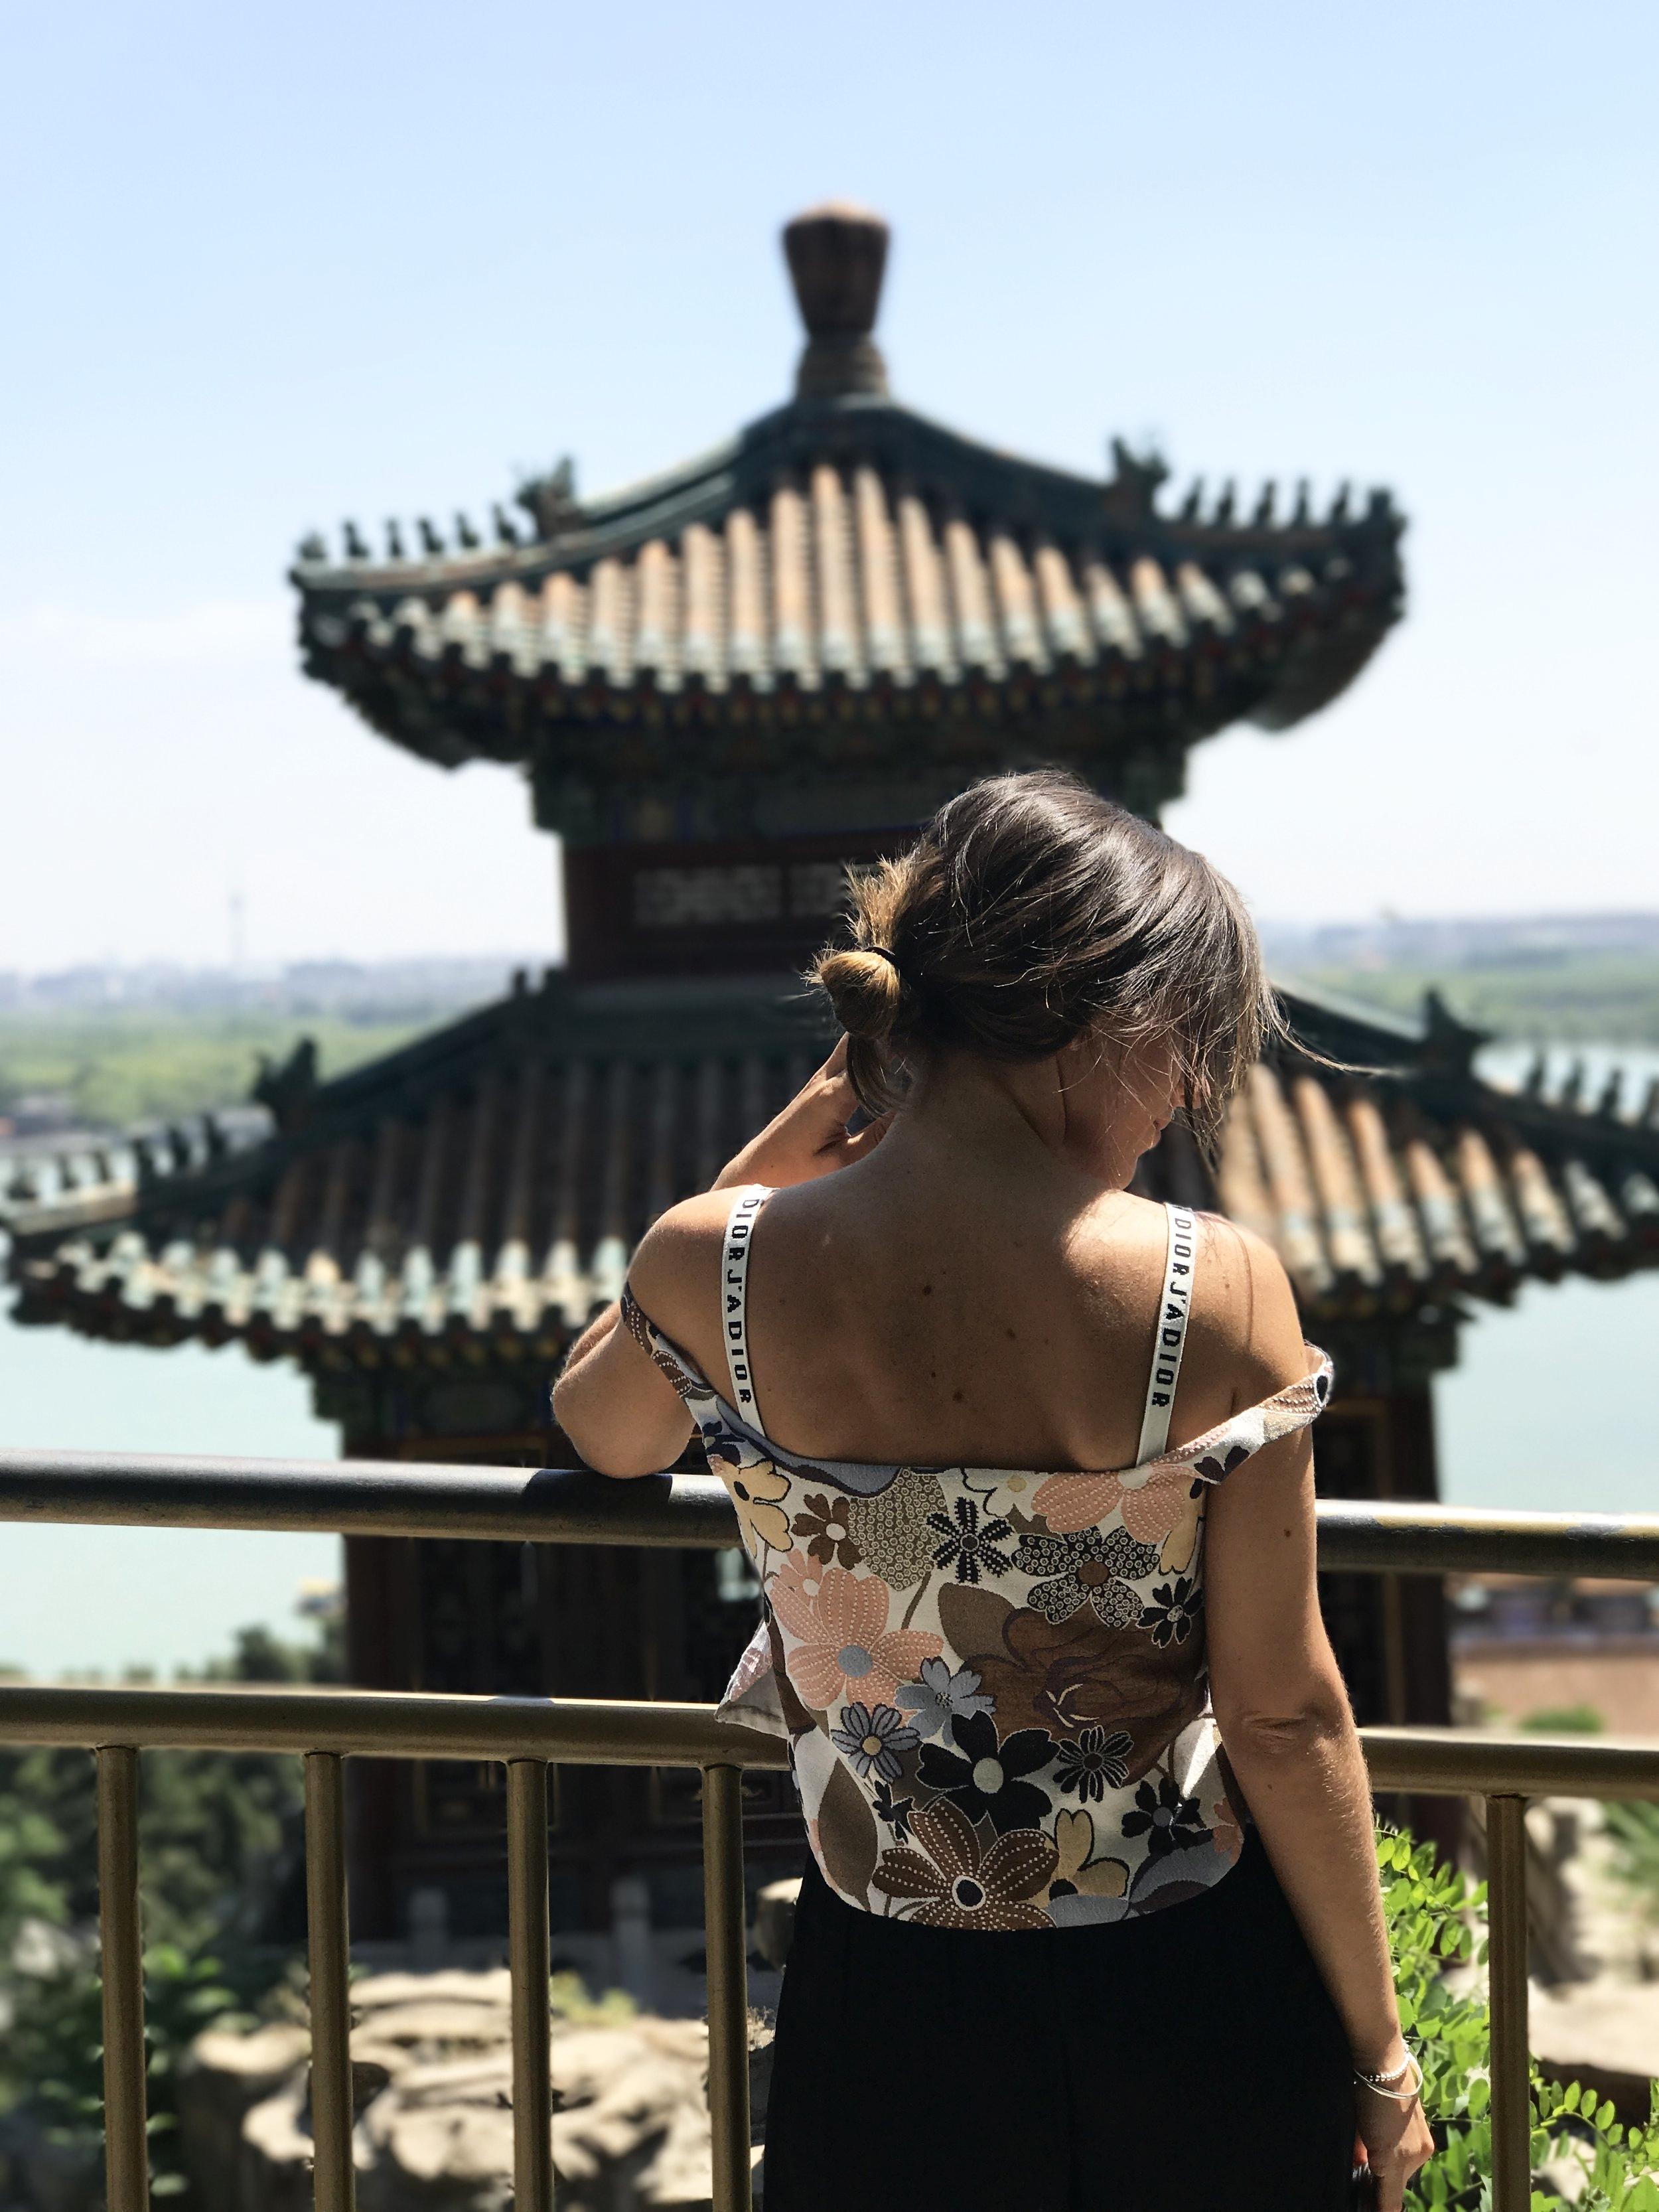 Xiè Xiè Beijing - You were a pleasure in all senses.